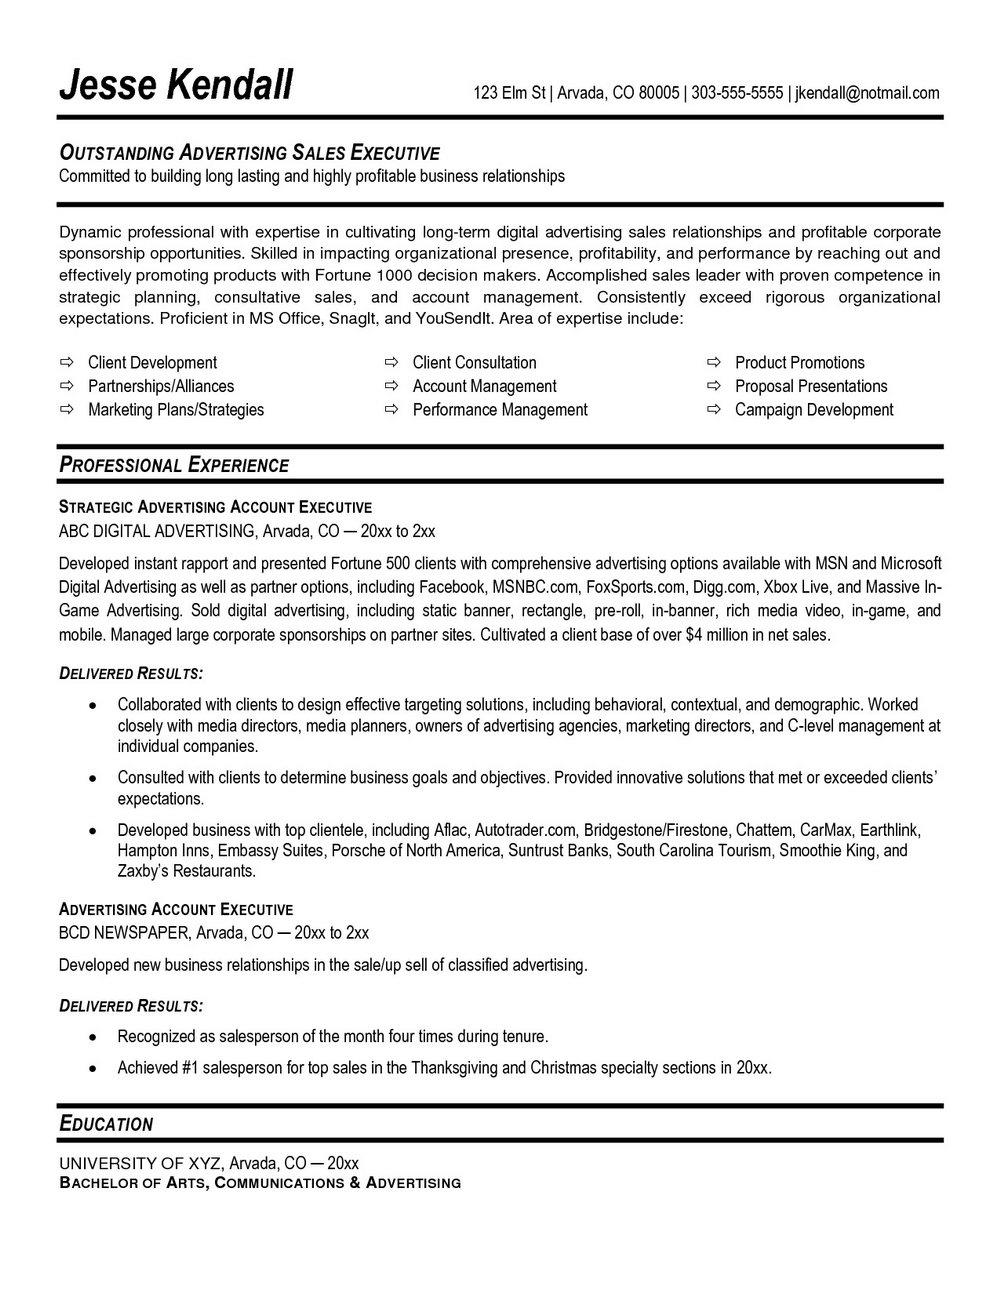 Senior Executive Resume Template Free